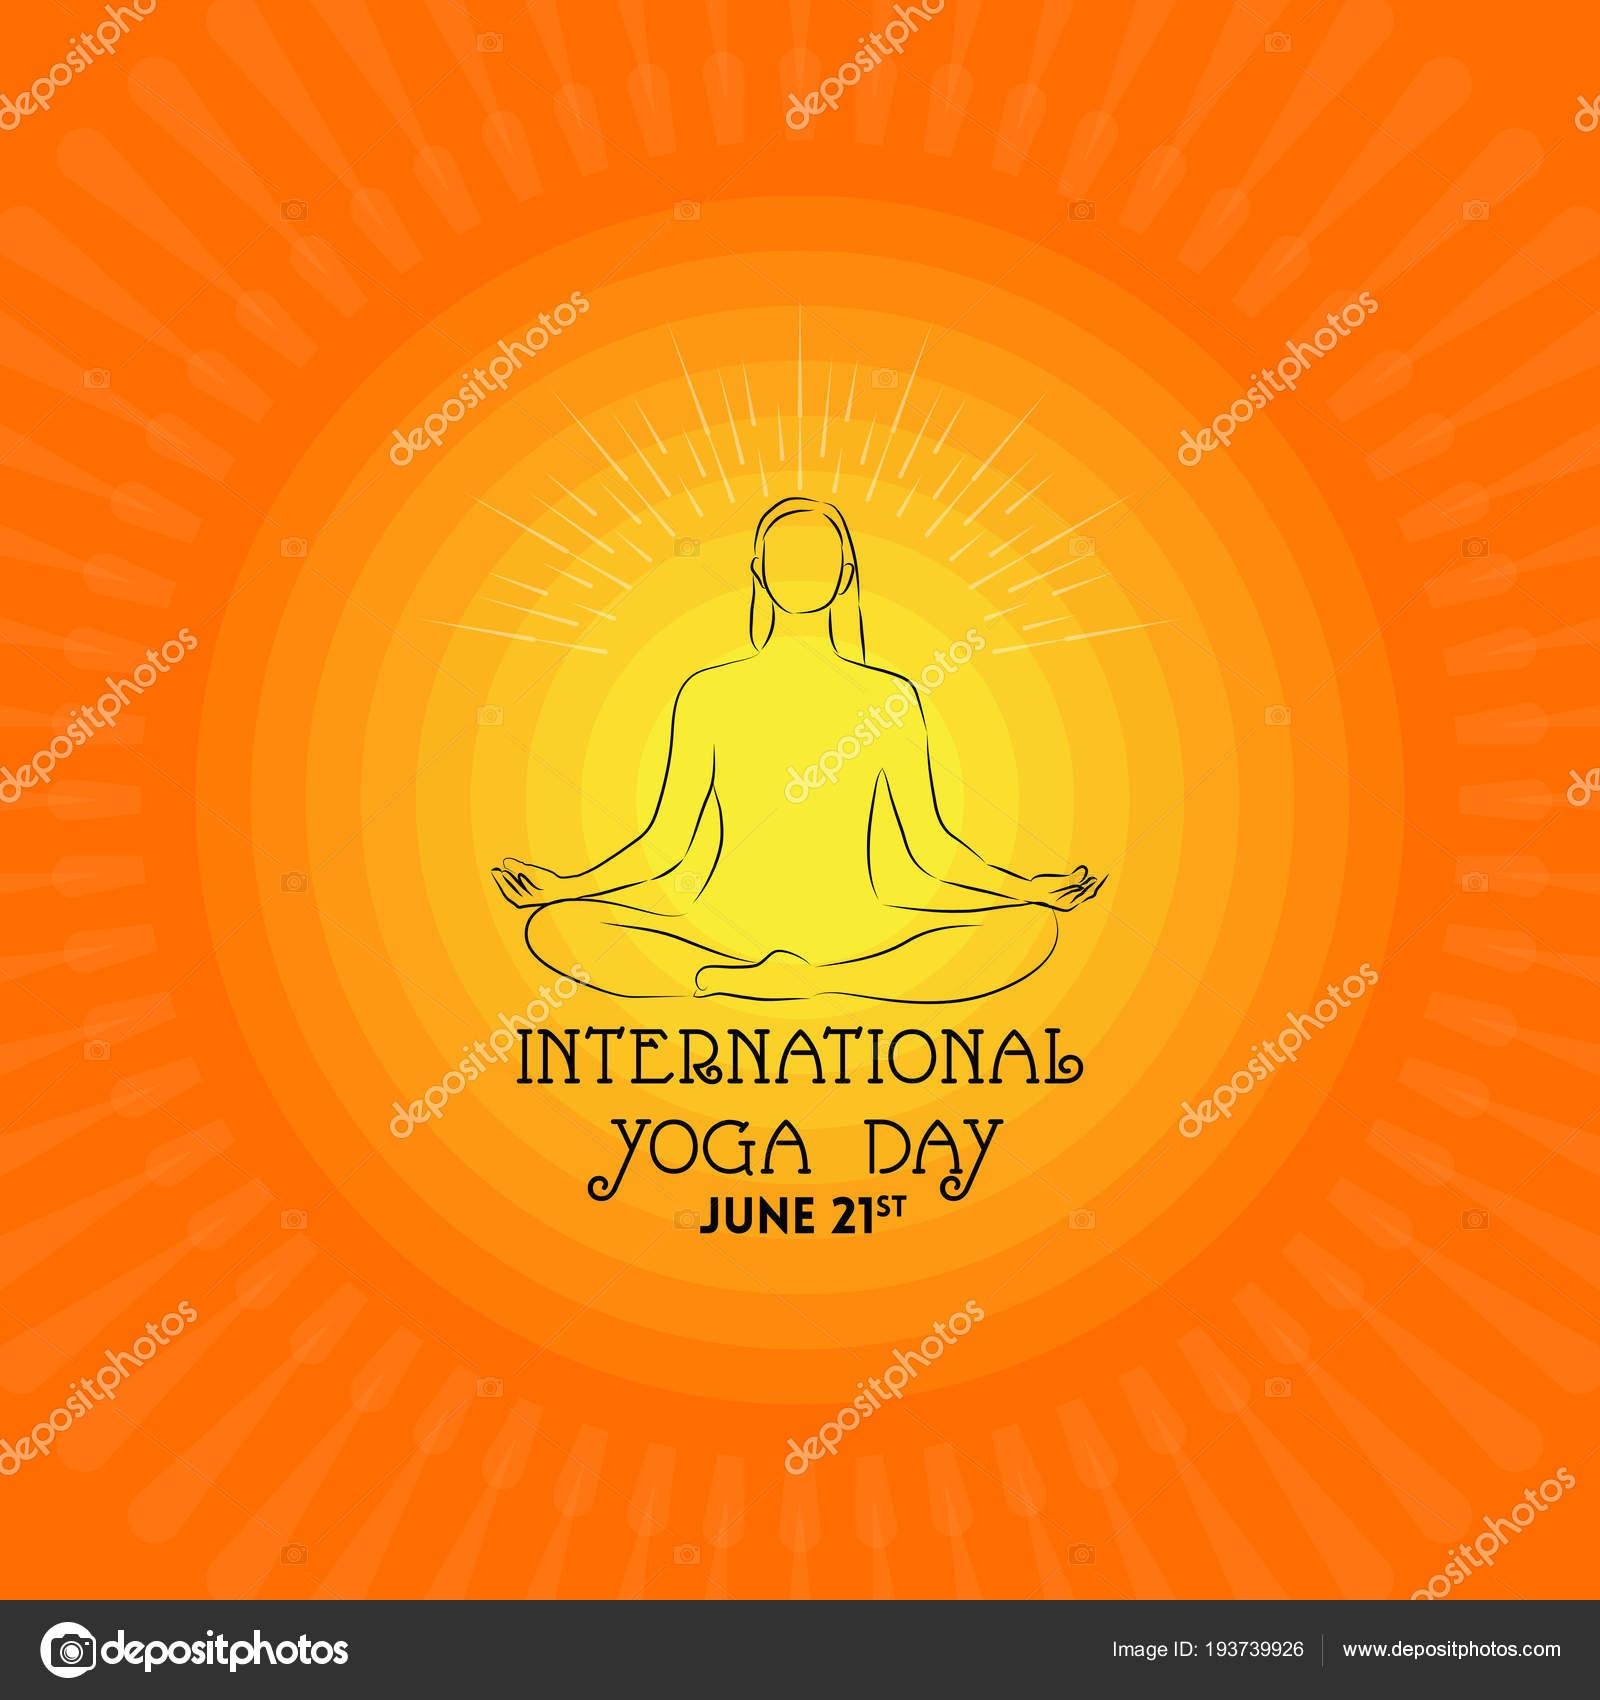 International Yoga Day Banner Female Silhouette Sunny Background Stock Vector C Satheeshsankaran 193739926